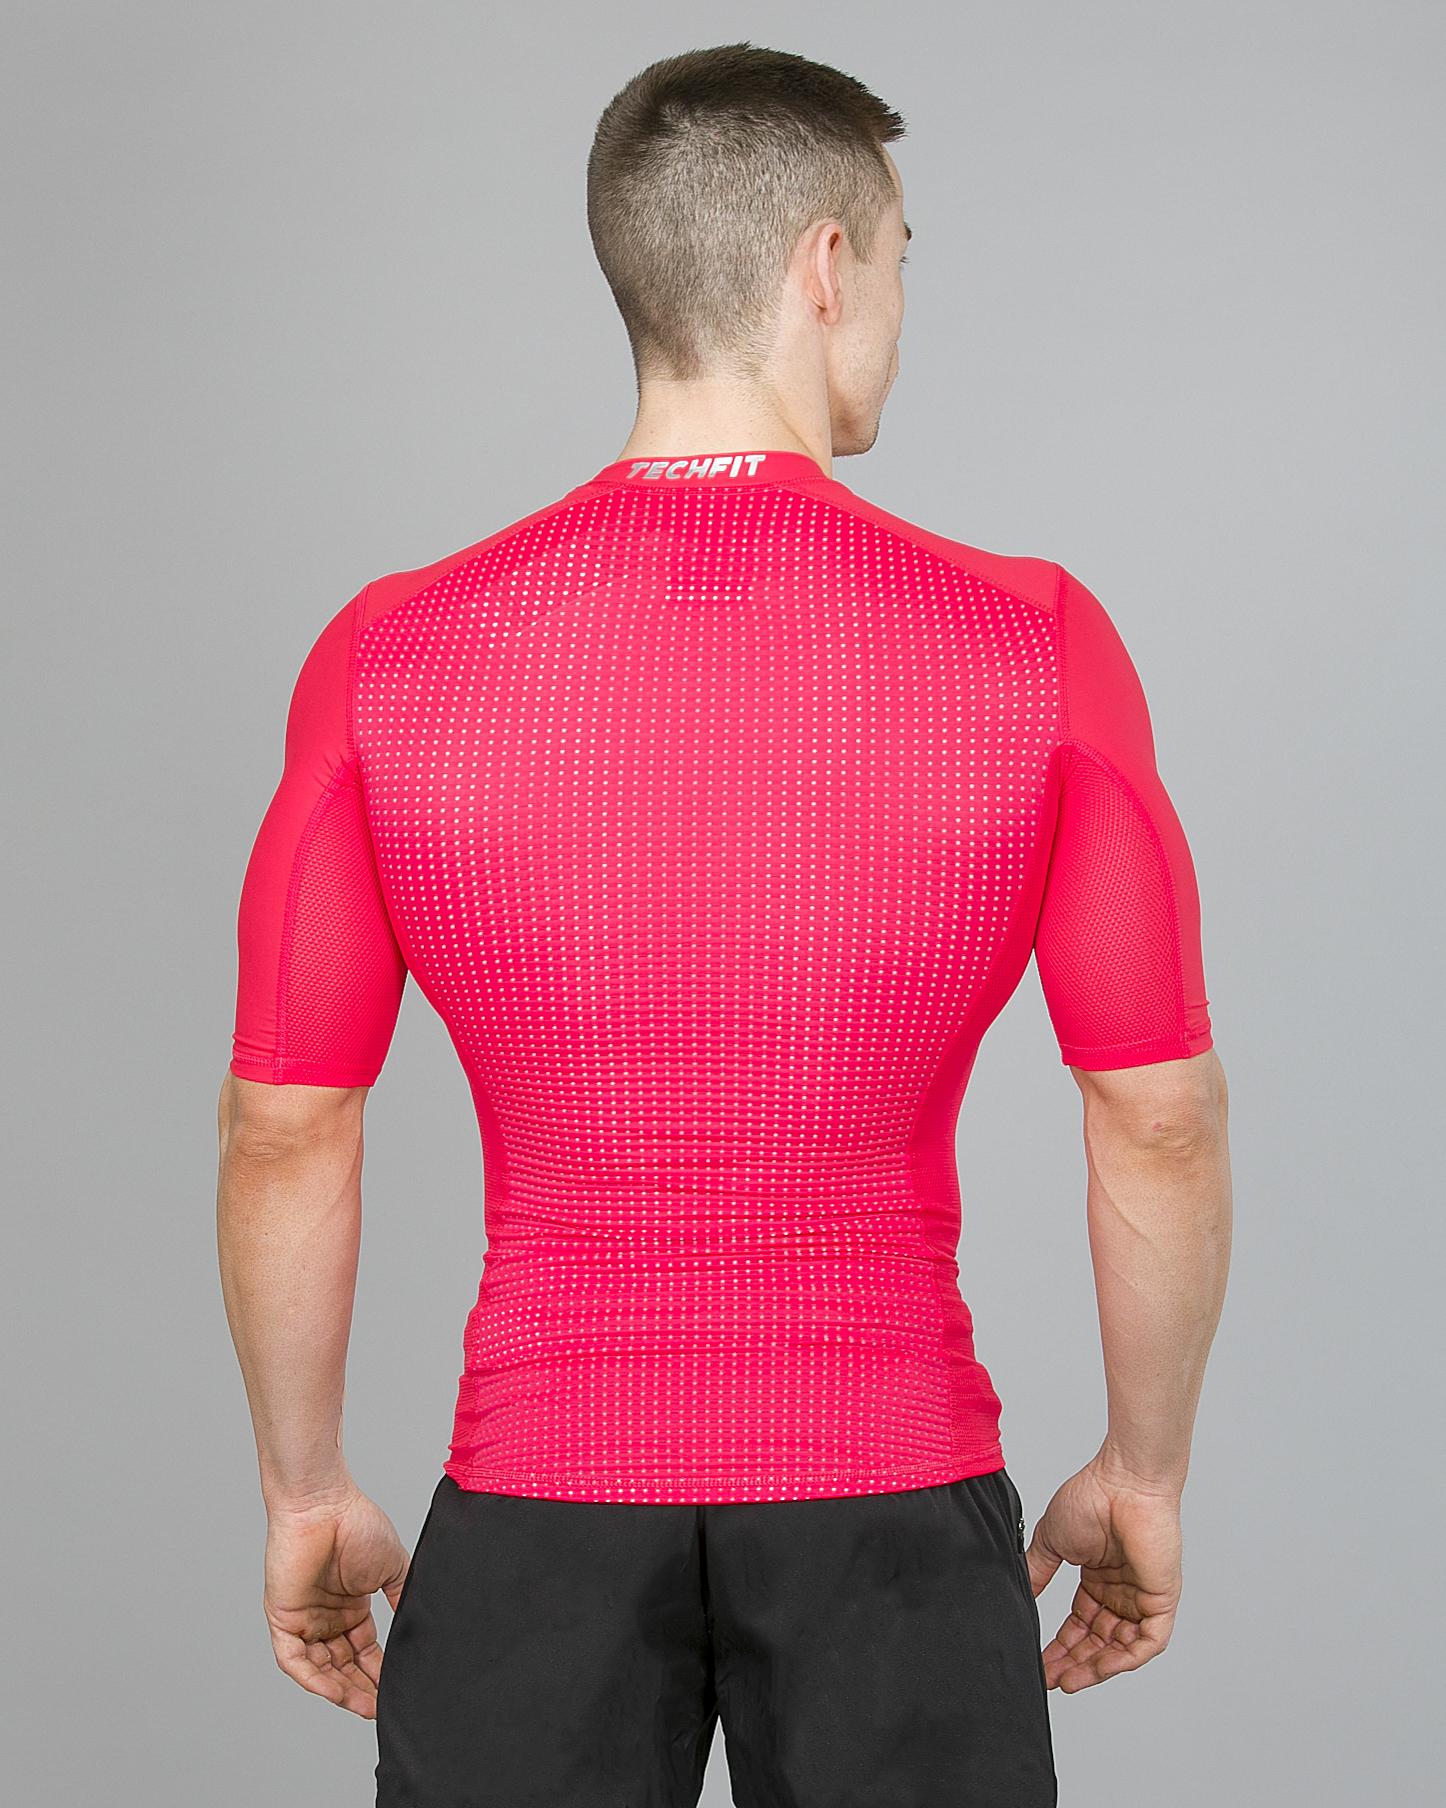 Adidas Mens Techfit Chill Short Sleeve Tee Red Tights.no